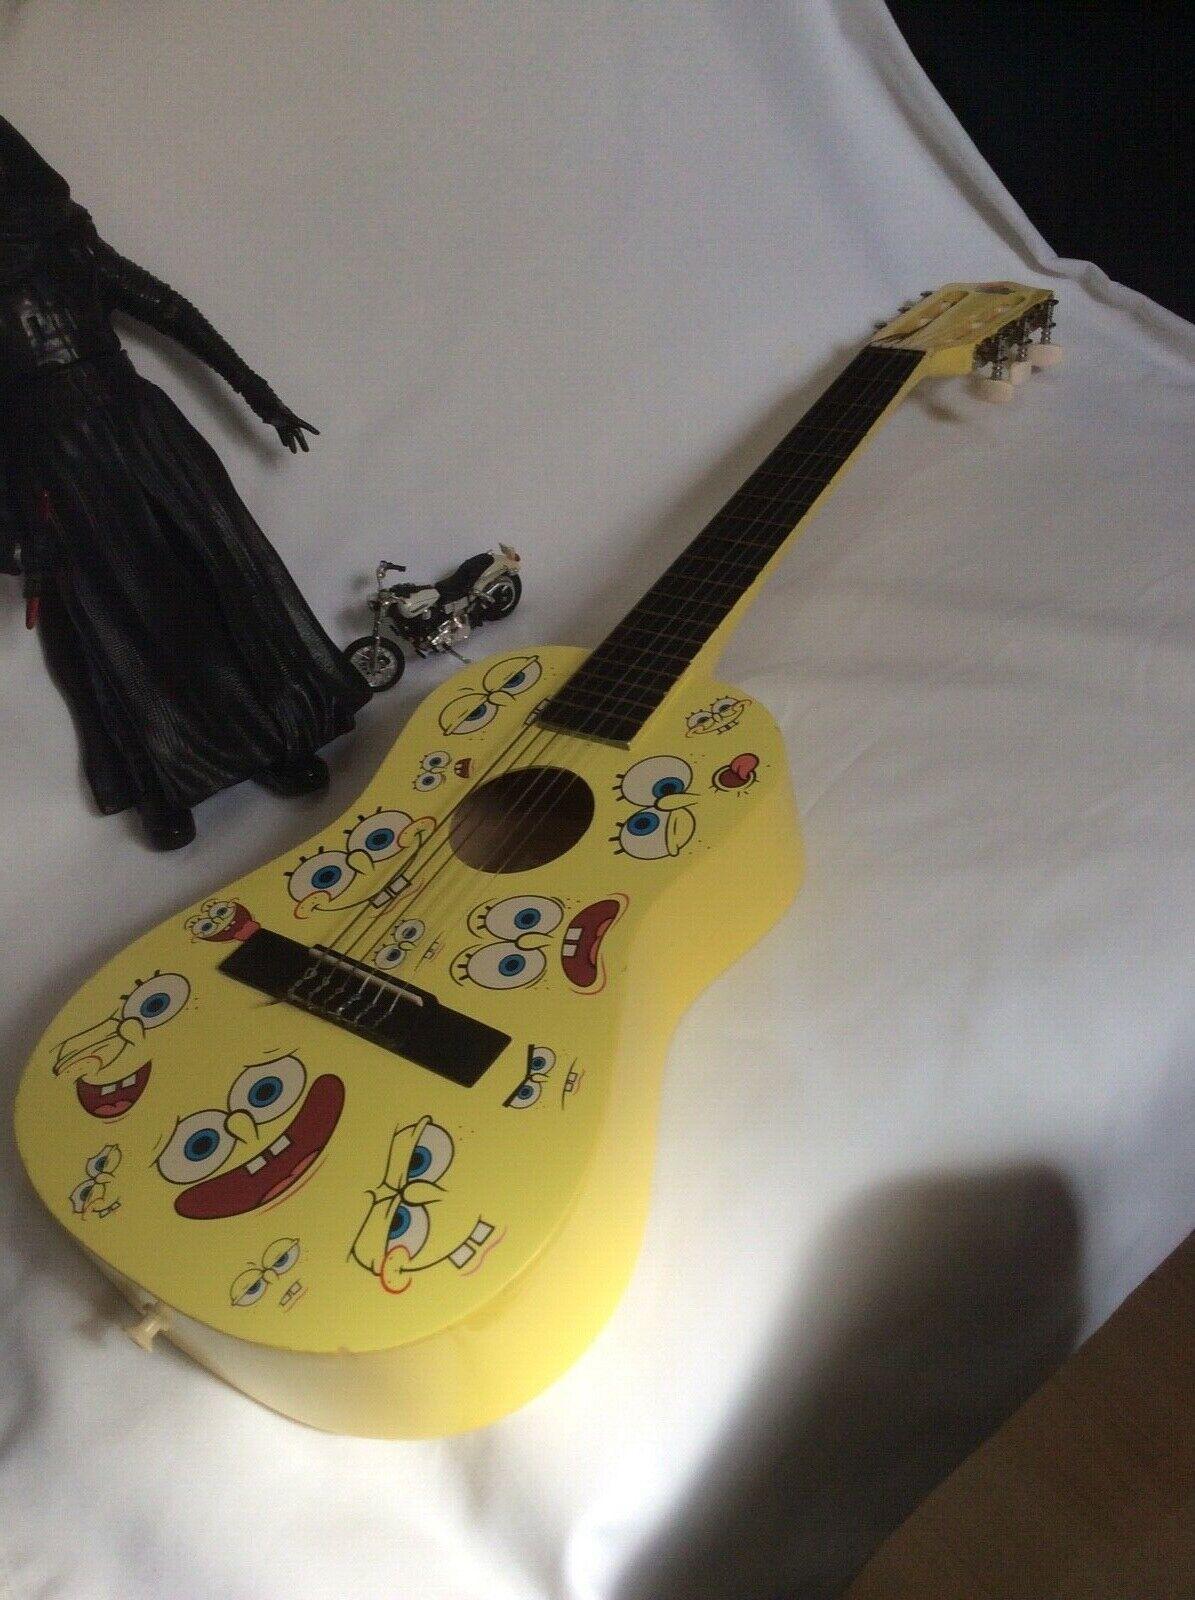 Spongebob Acoustic Guitar (Kiddies Junior)